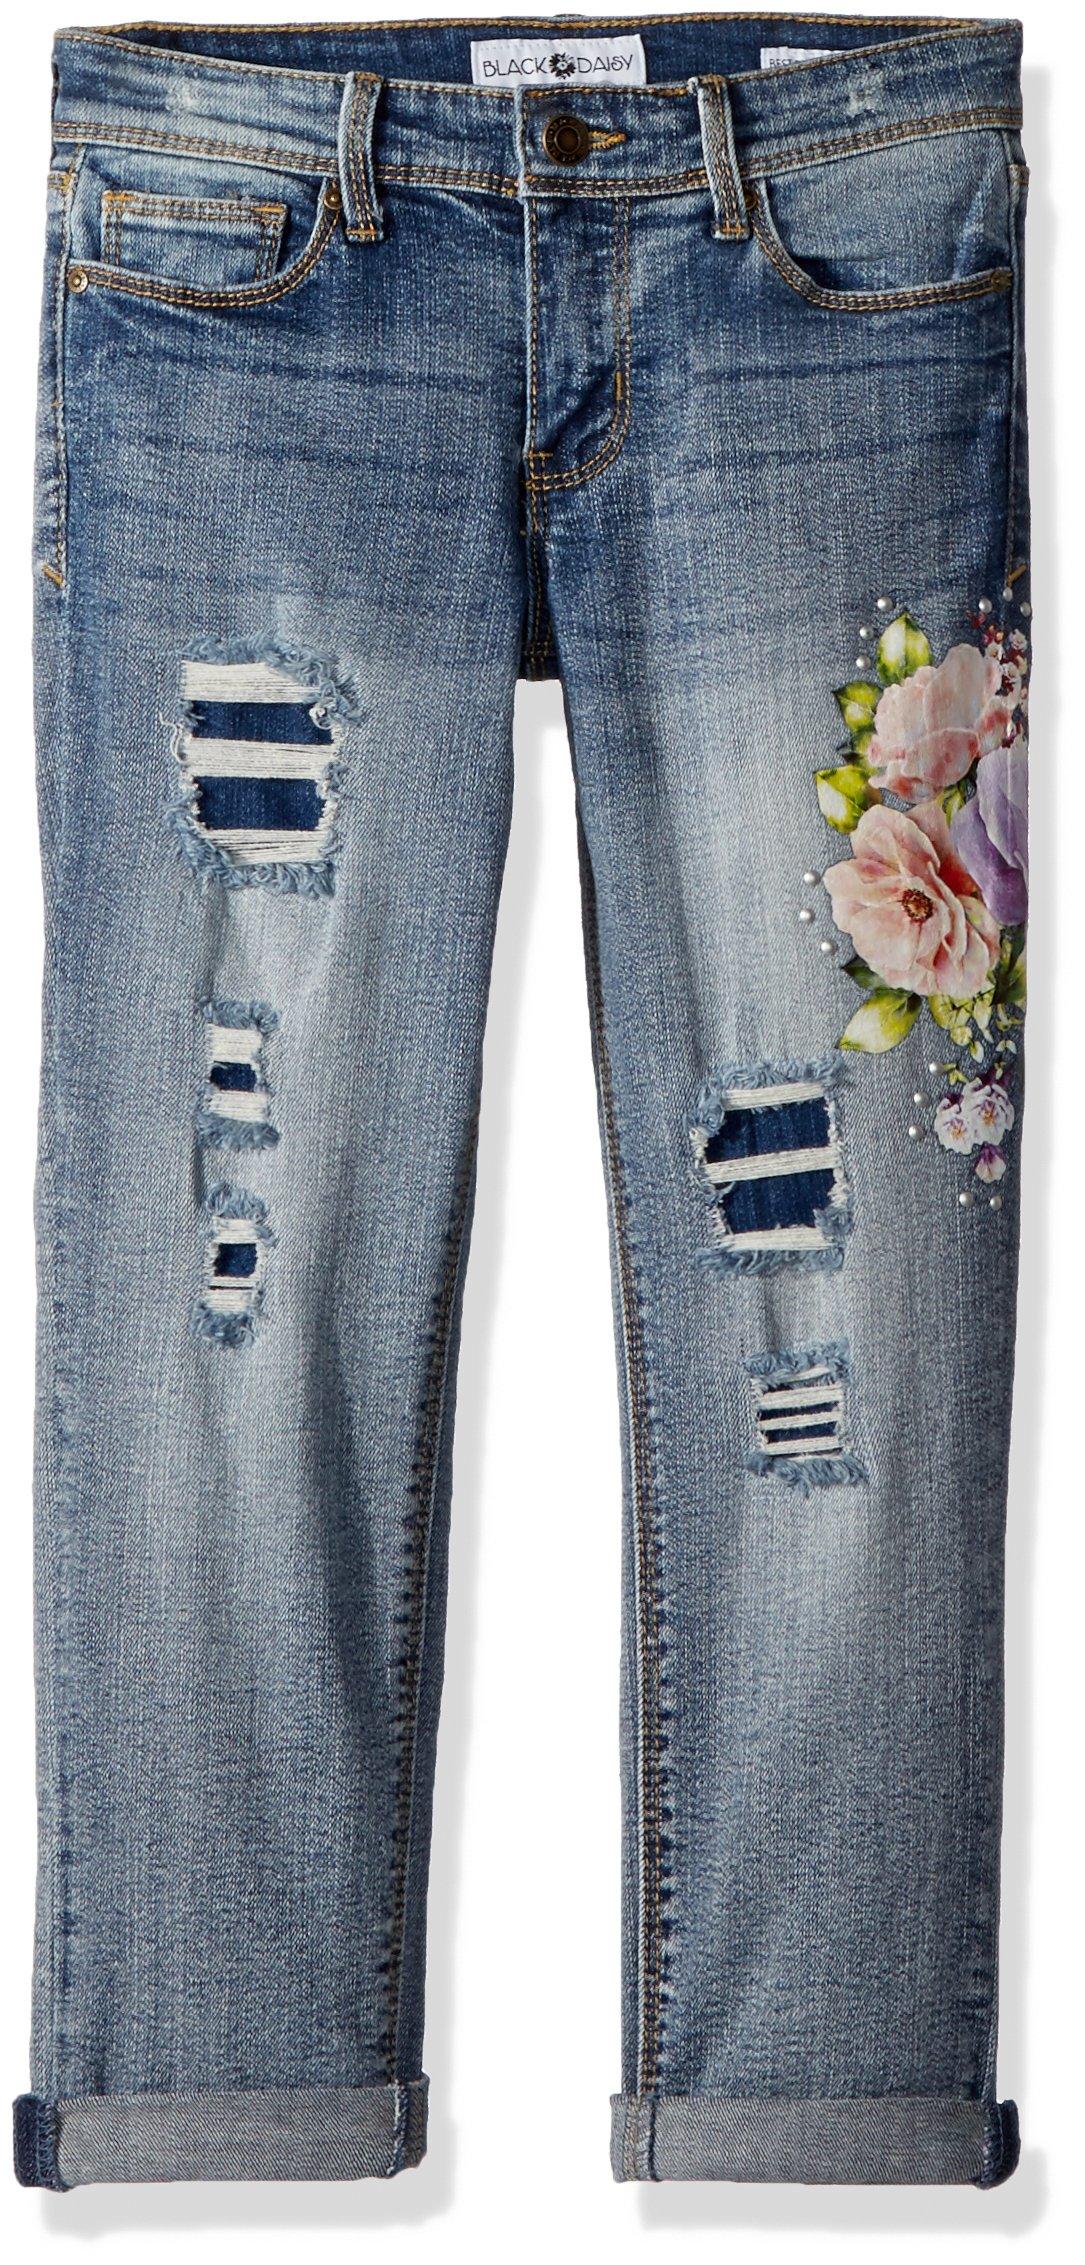 Black Daisy Big Girls' Tween Best Friend Relaxed Skinny Jean, Audition Destruction/Floral Print, 14